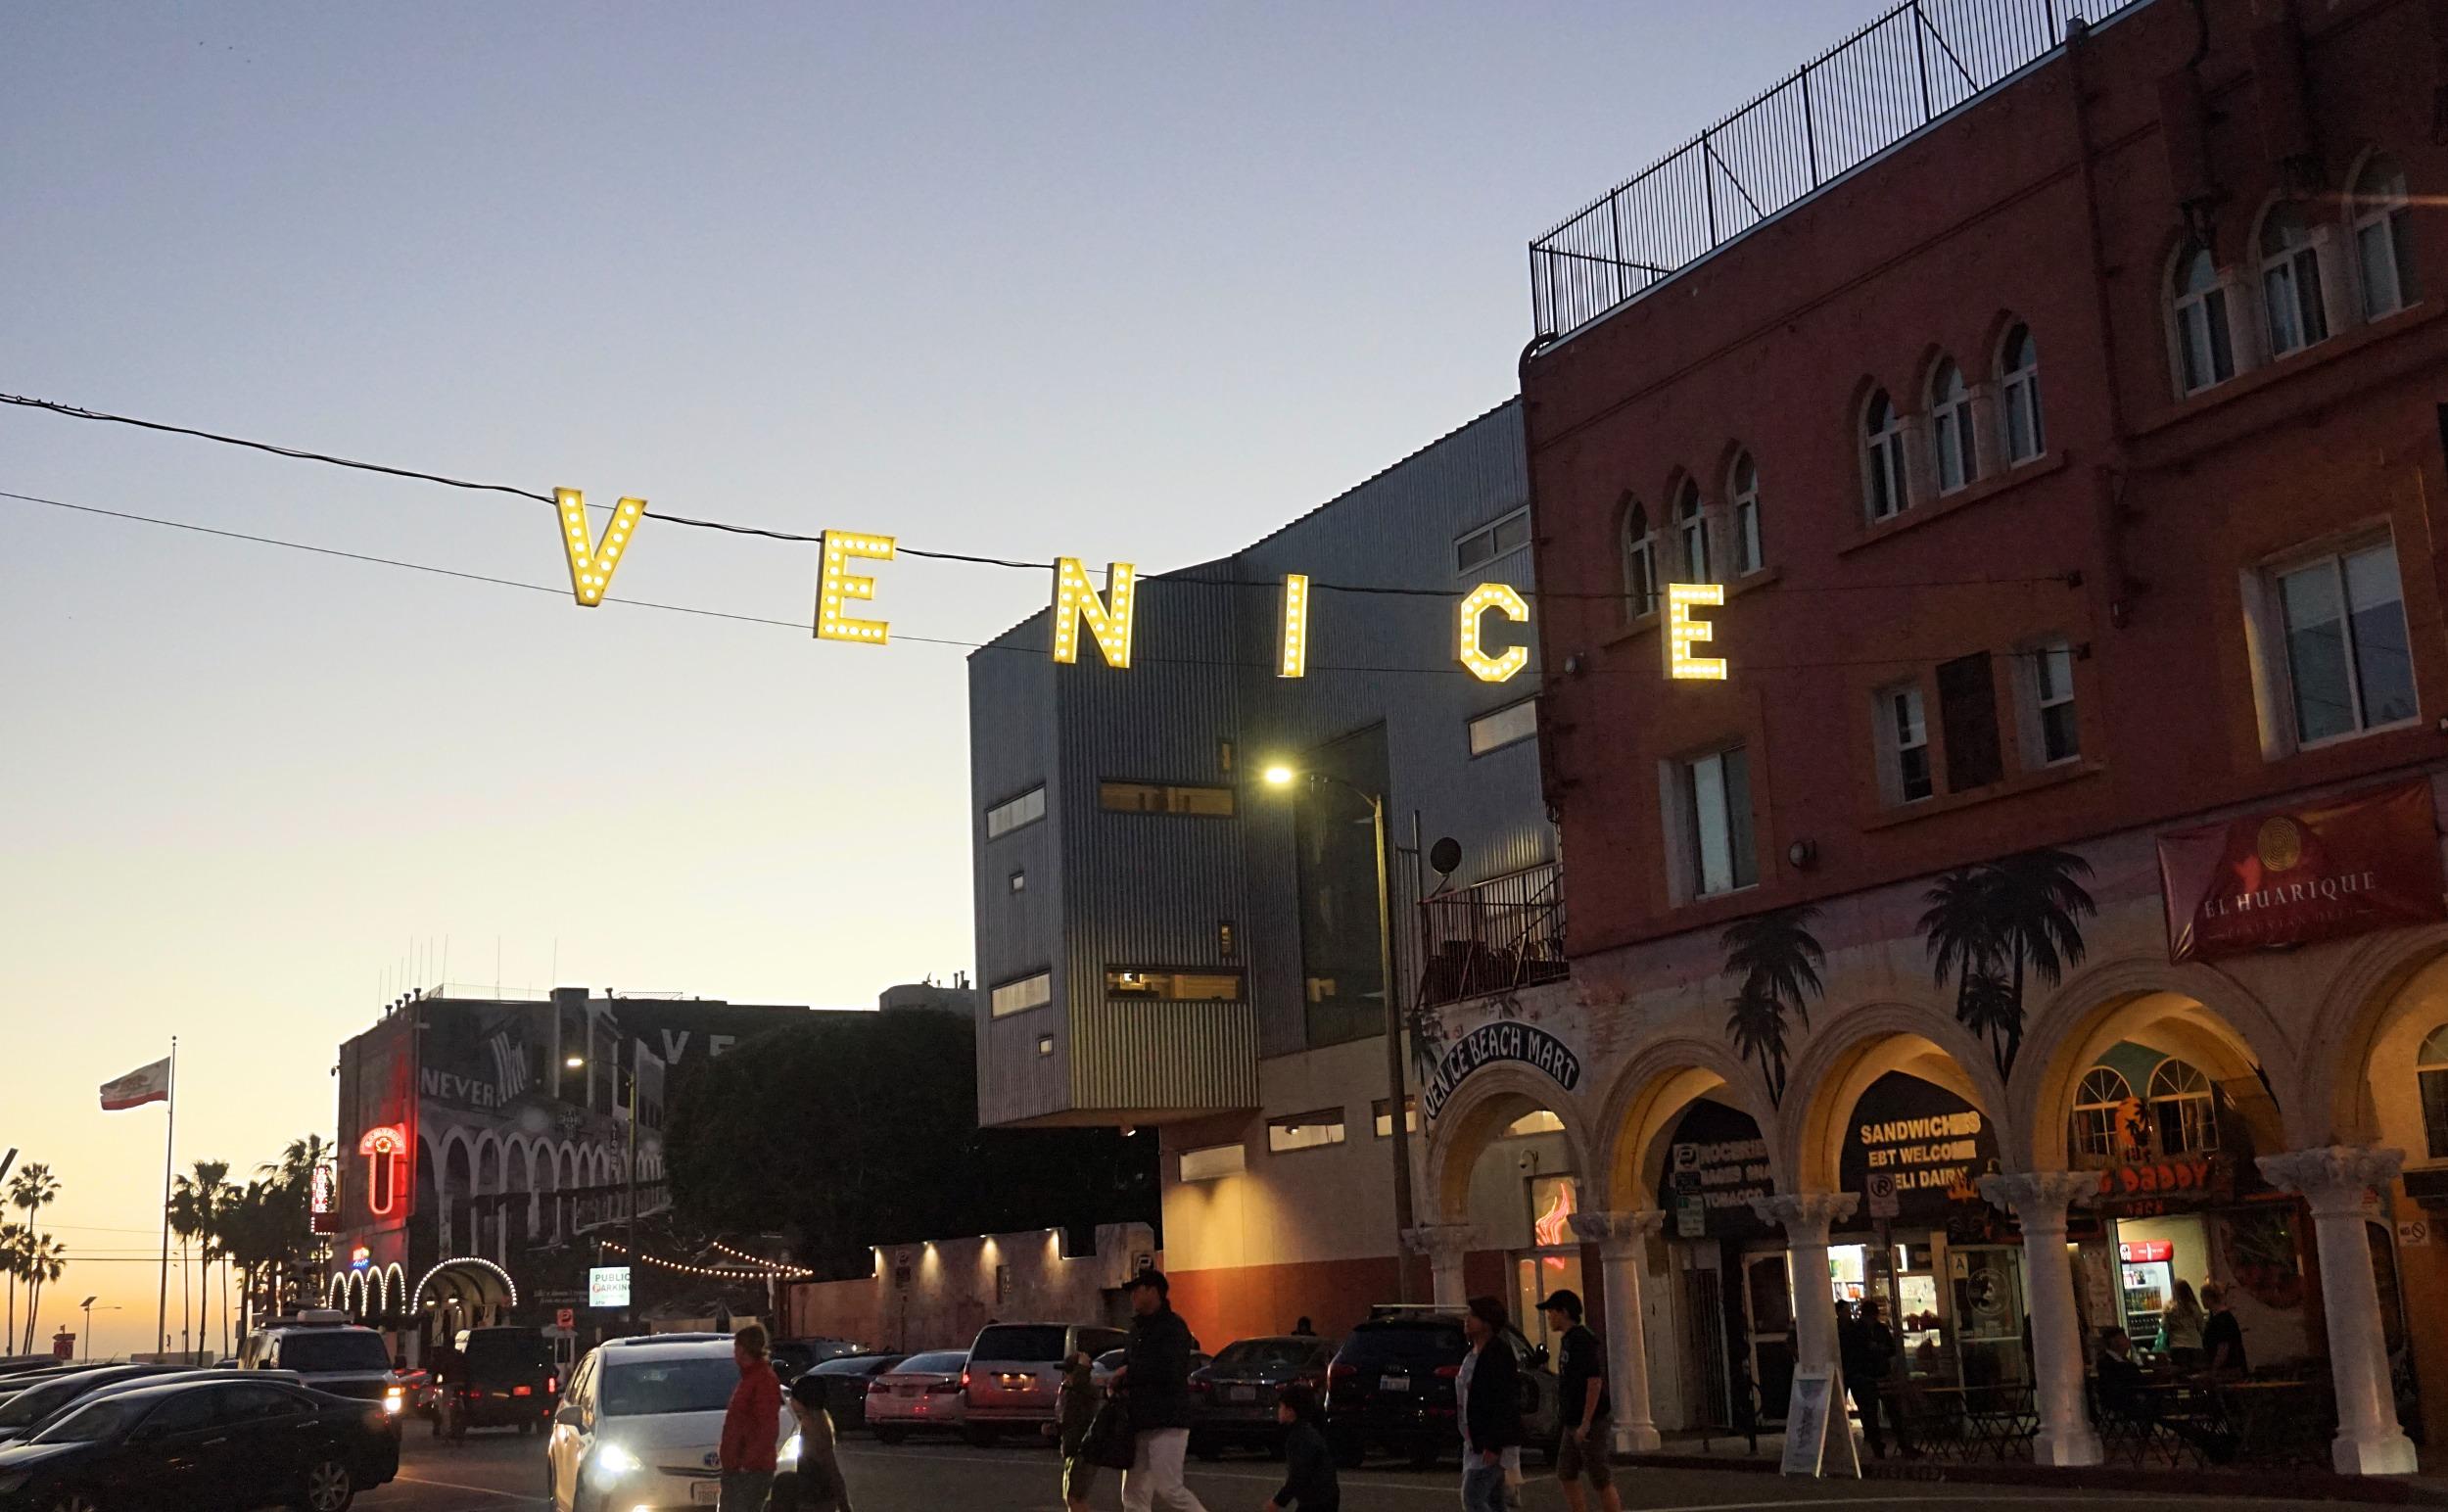 Evening Venice